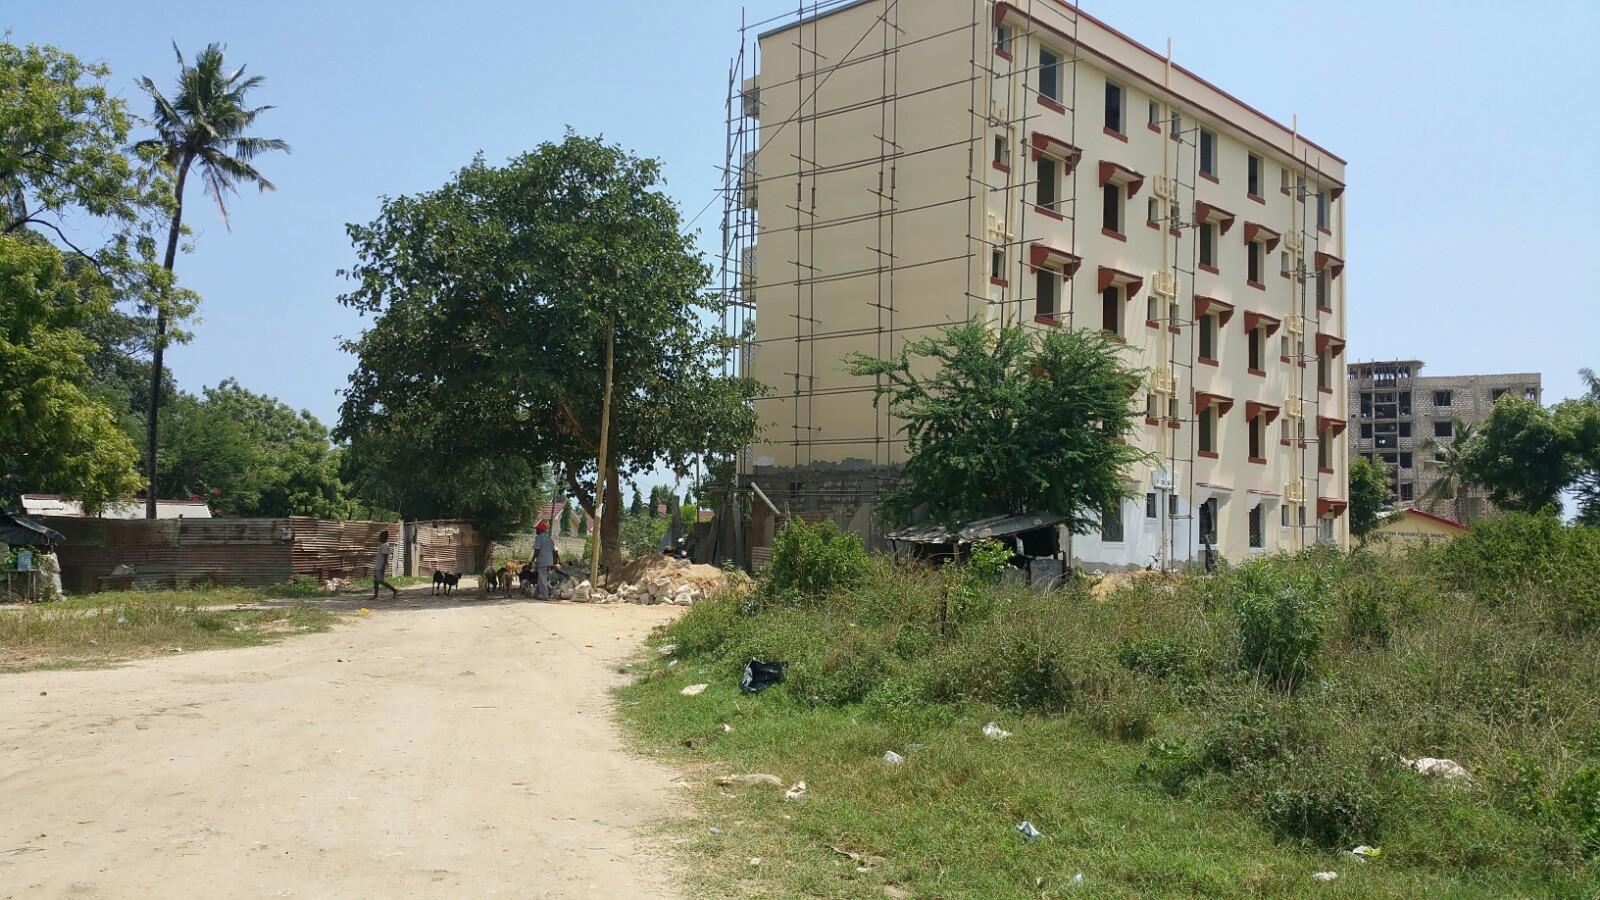 Quarter acre for sale in Bamburi Fisheries area